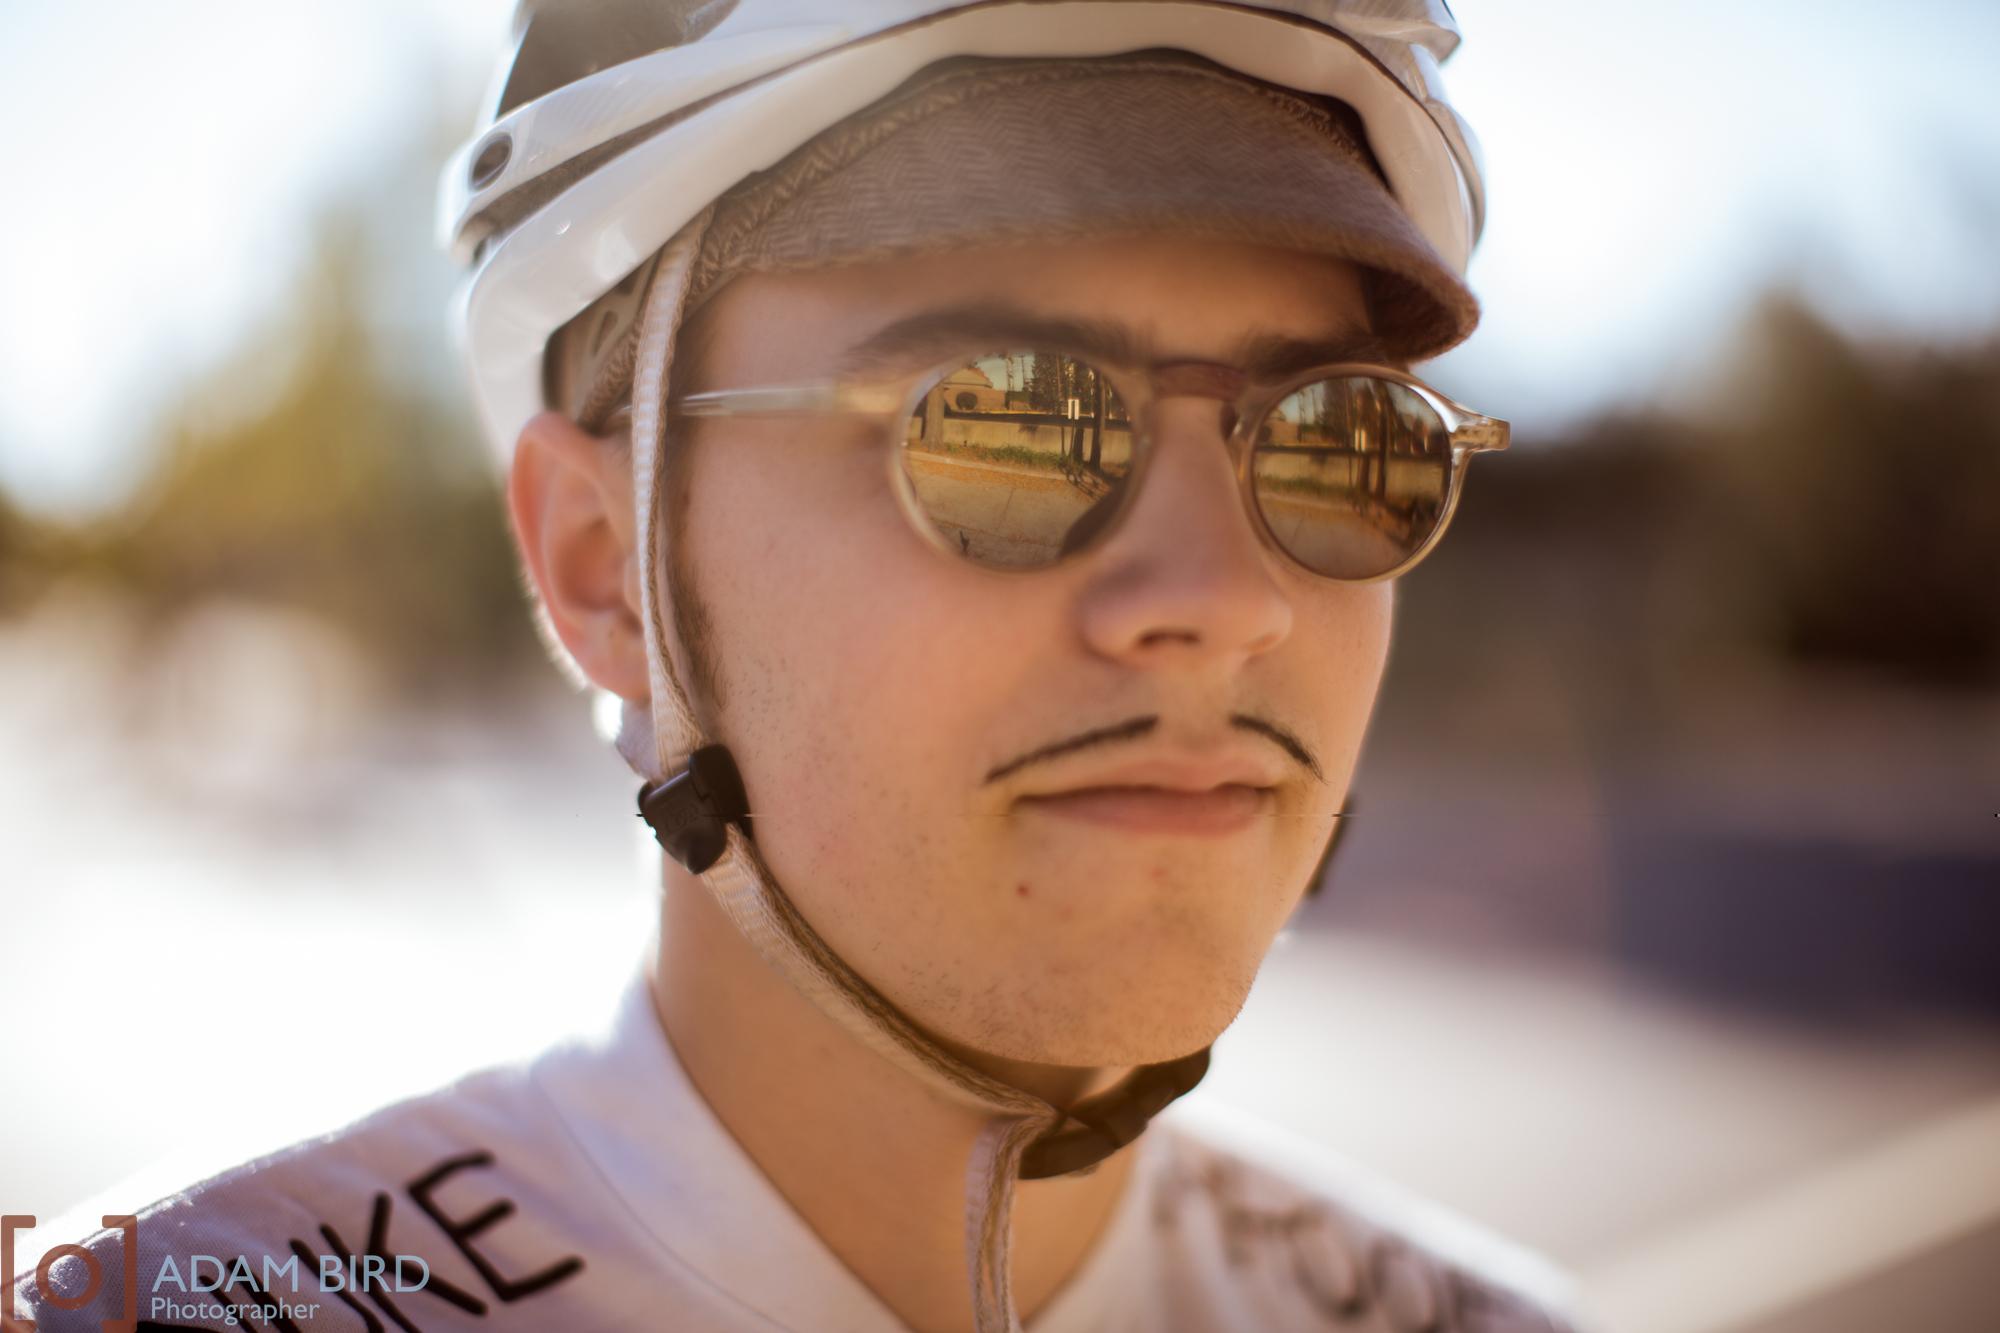 josh_mcvety_bike_lanes_06.JPG